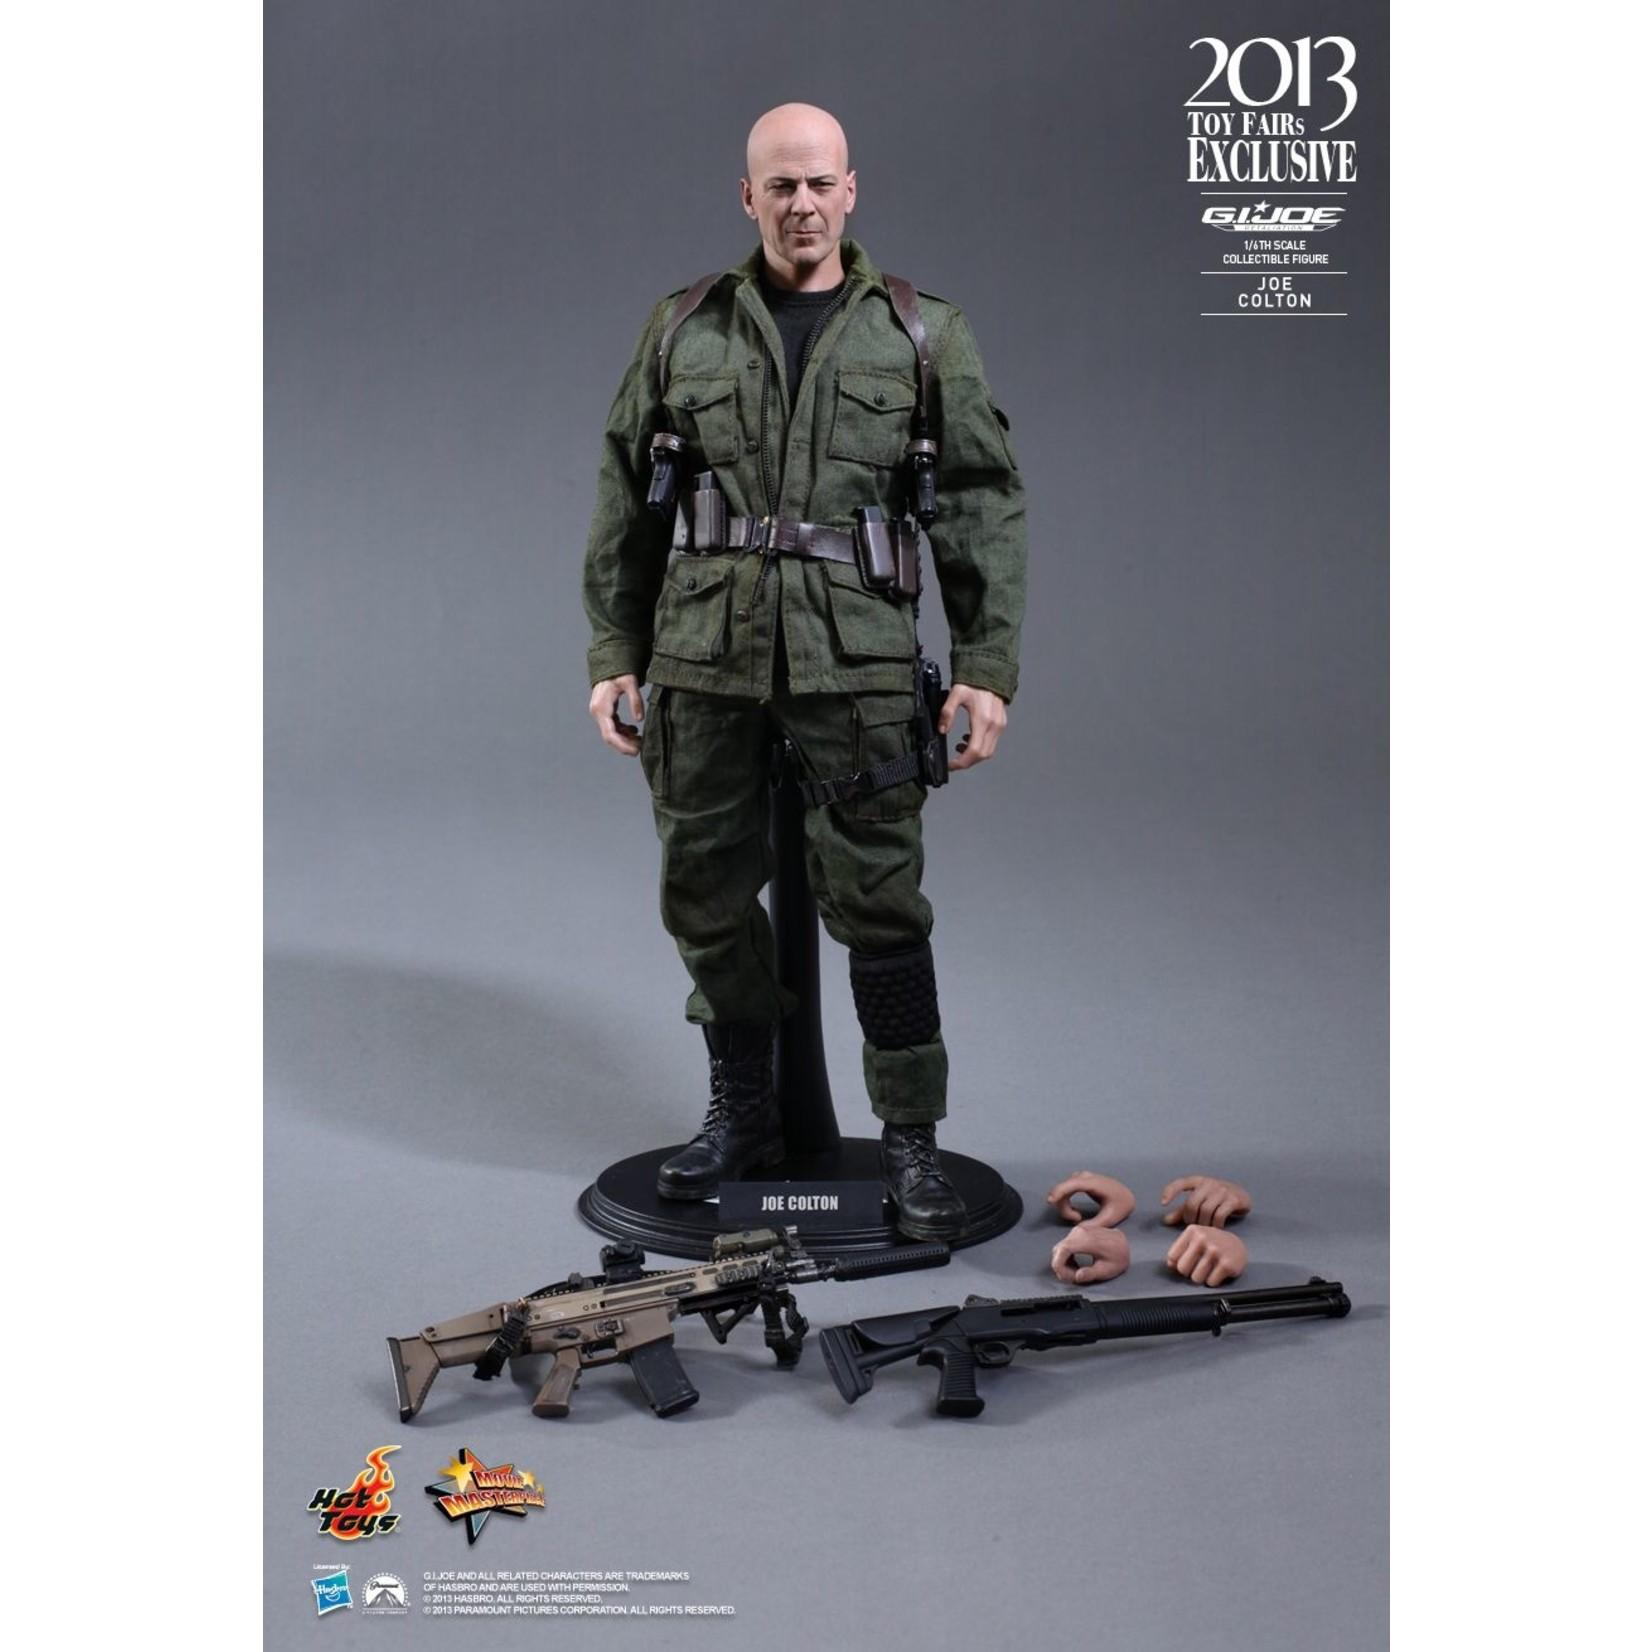 Hot Toys G.I. Joe Retaliation - Joe Colton MMS206